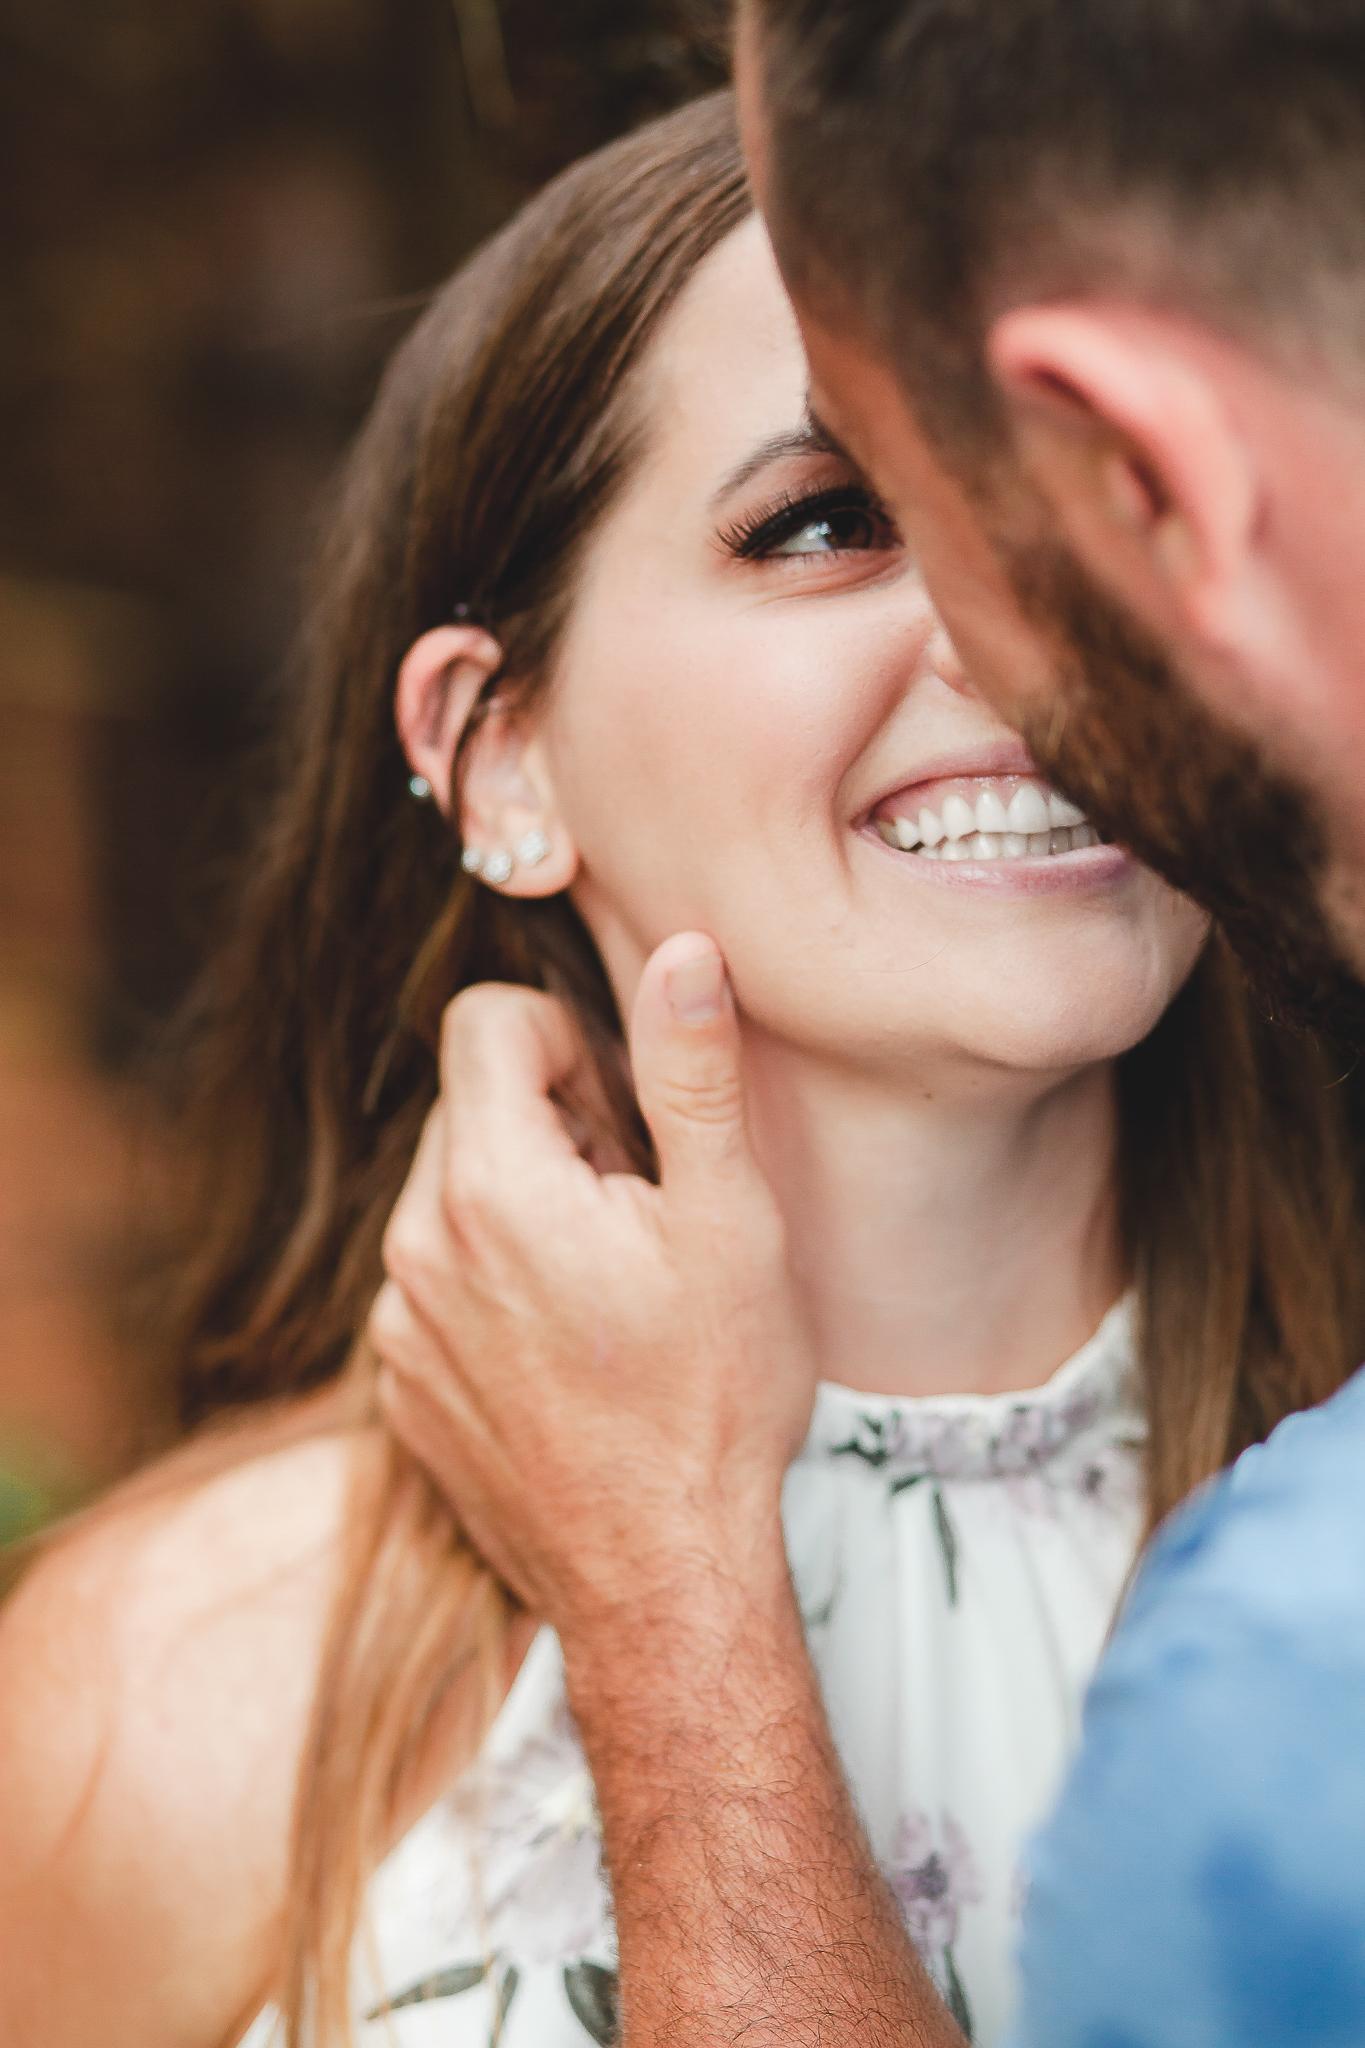 Amy D Photography- Barrie Wedding Photography- Barrie Wedding Photography- Engagement Session- Engagement Photography- Engagement Session Ideas- Wedding Photography-28.jpg